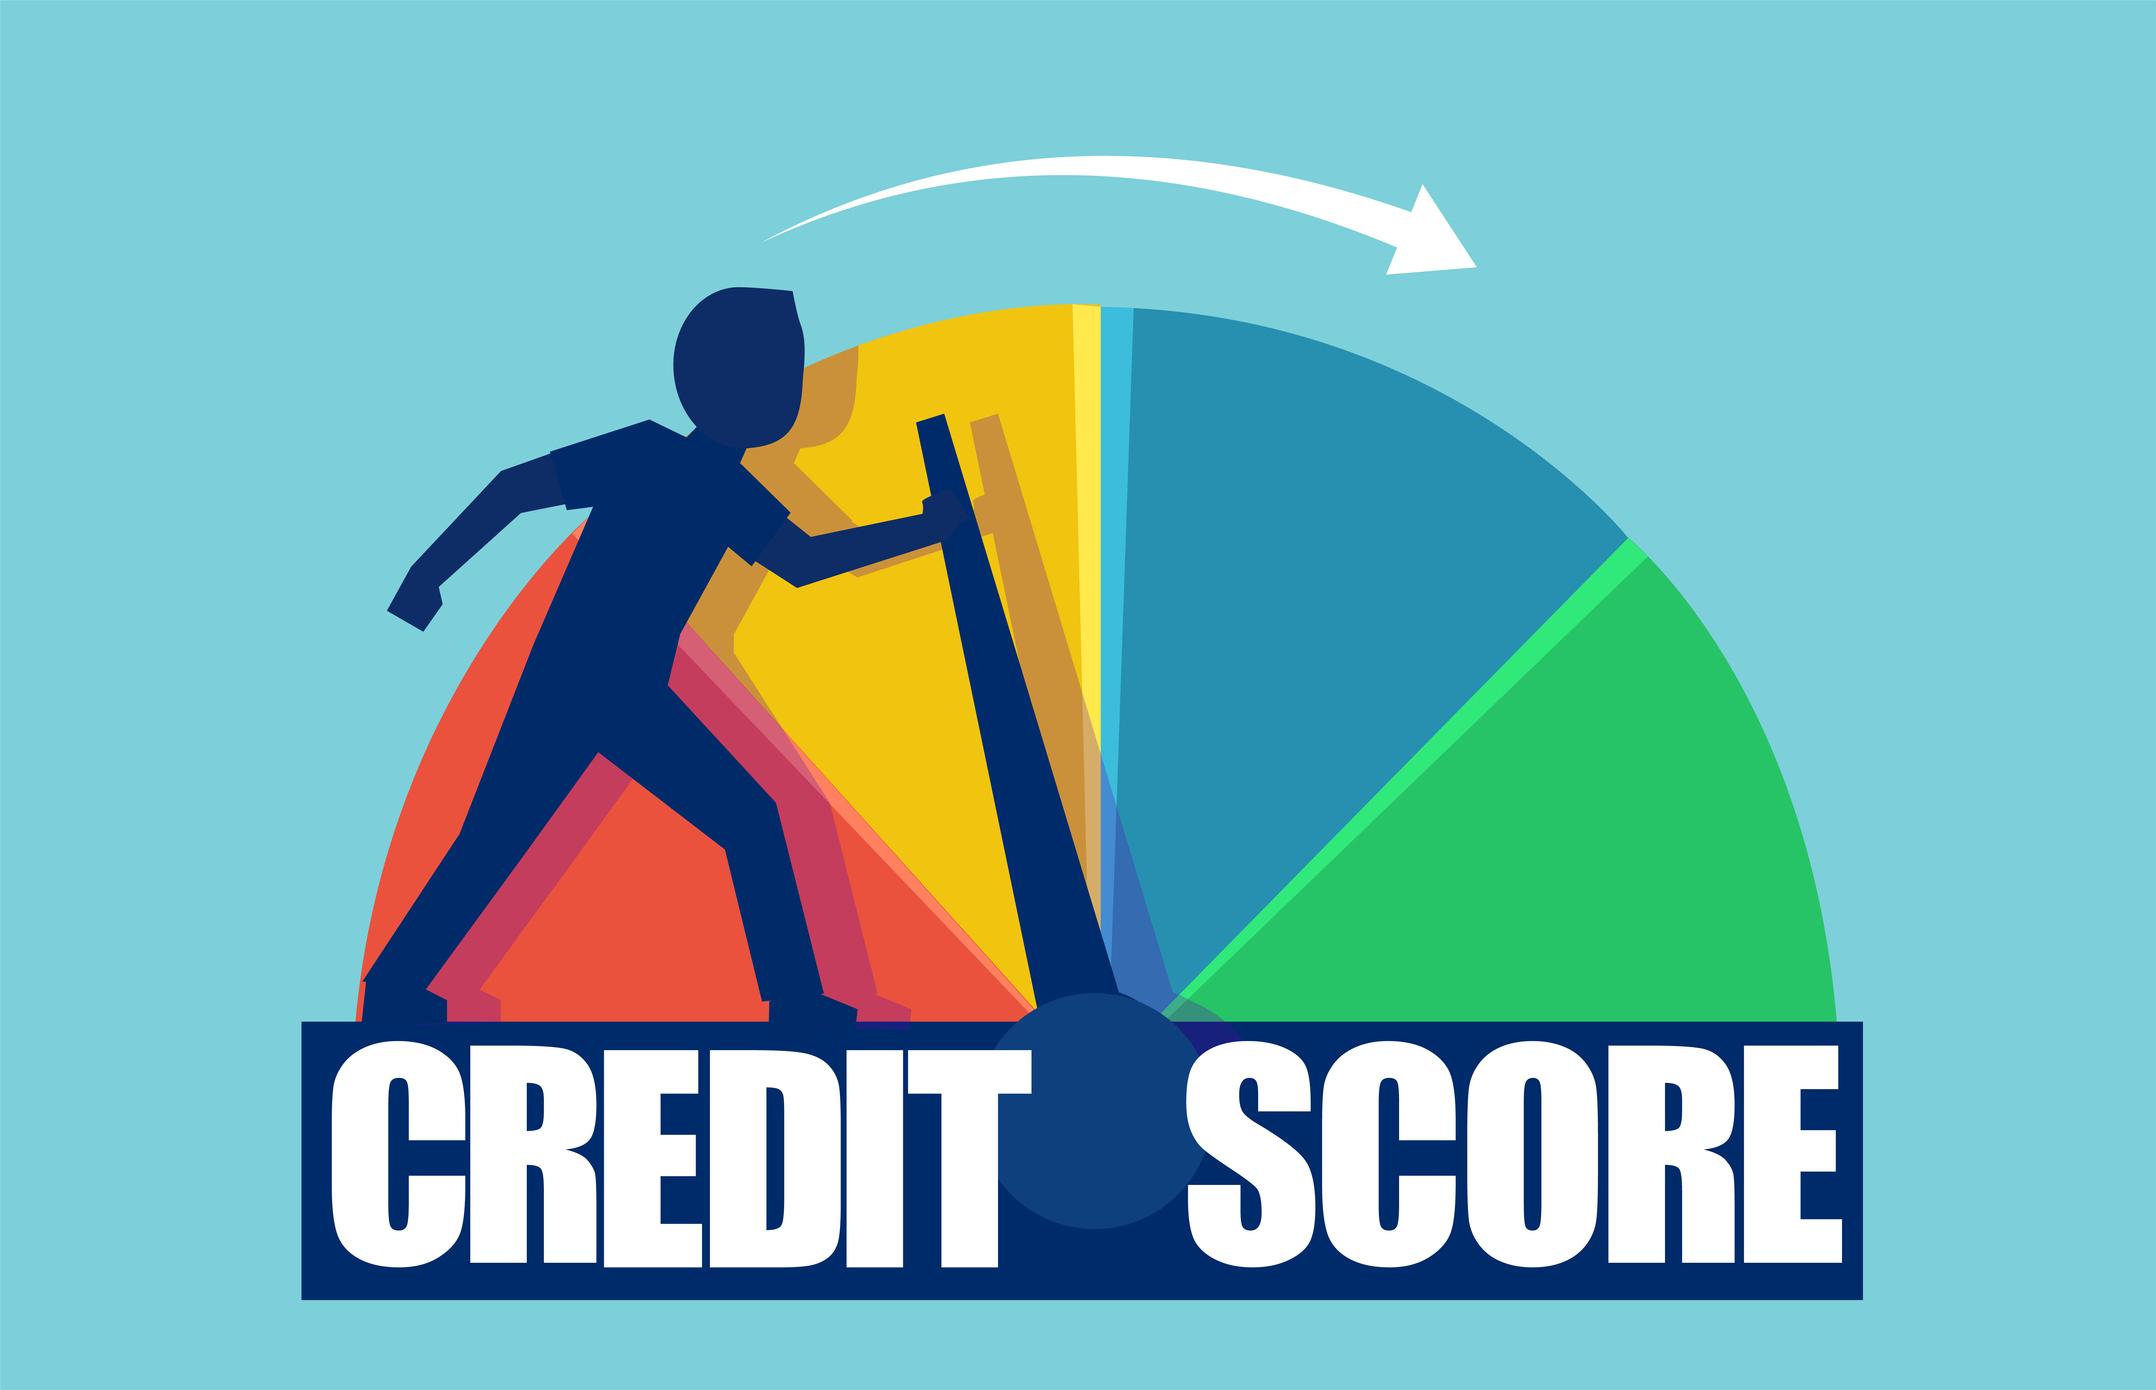 Credit Score - Complete Controller